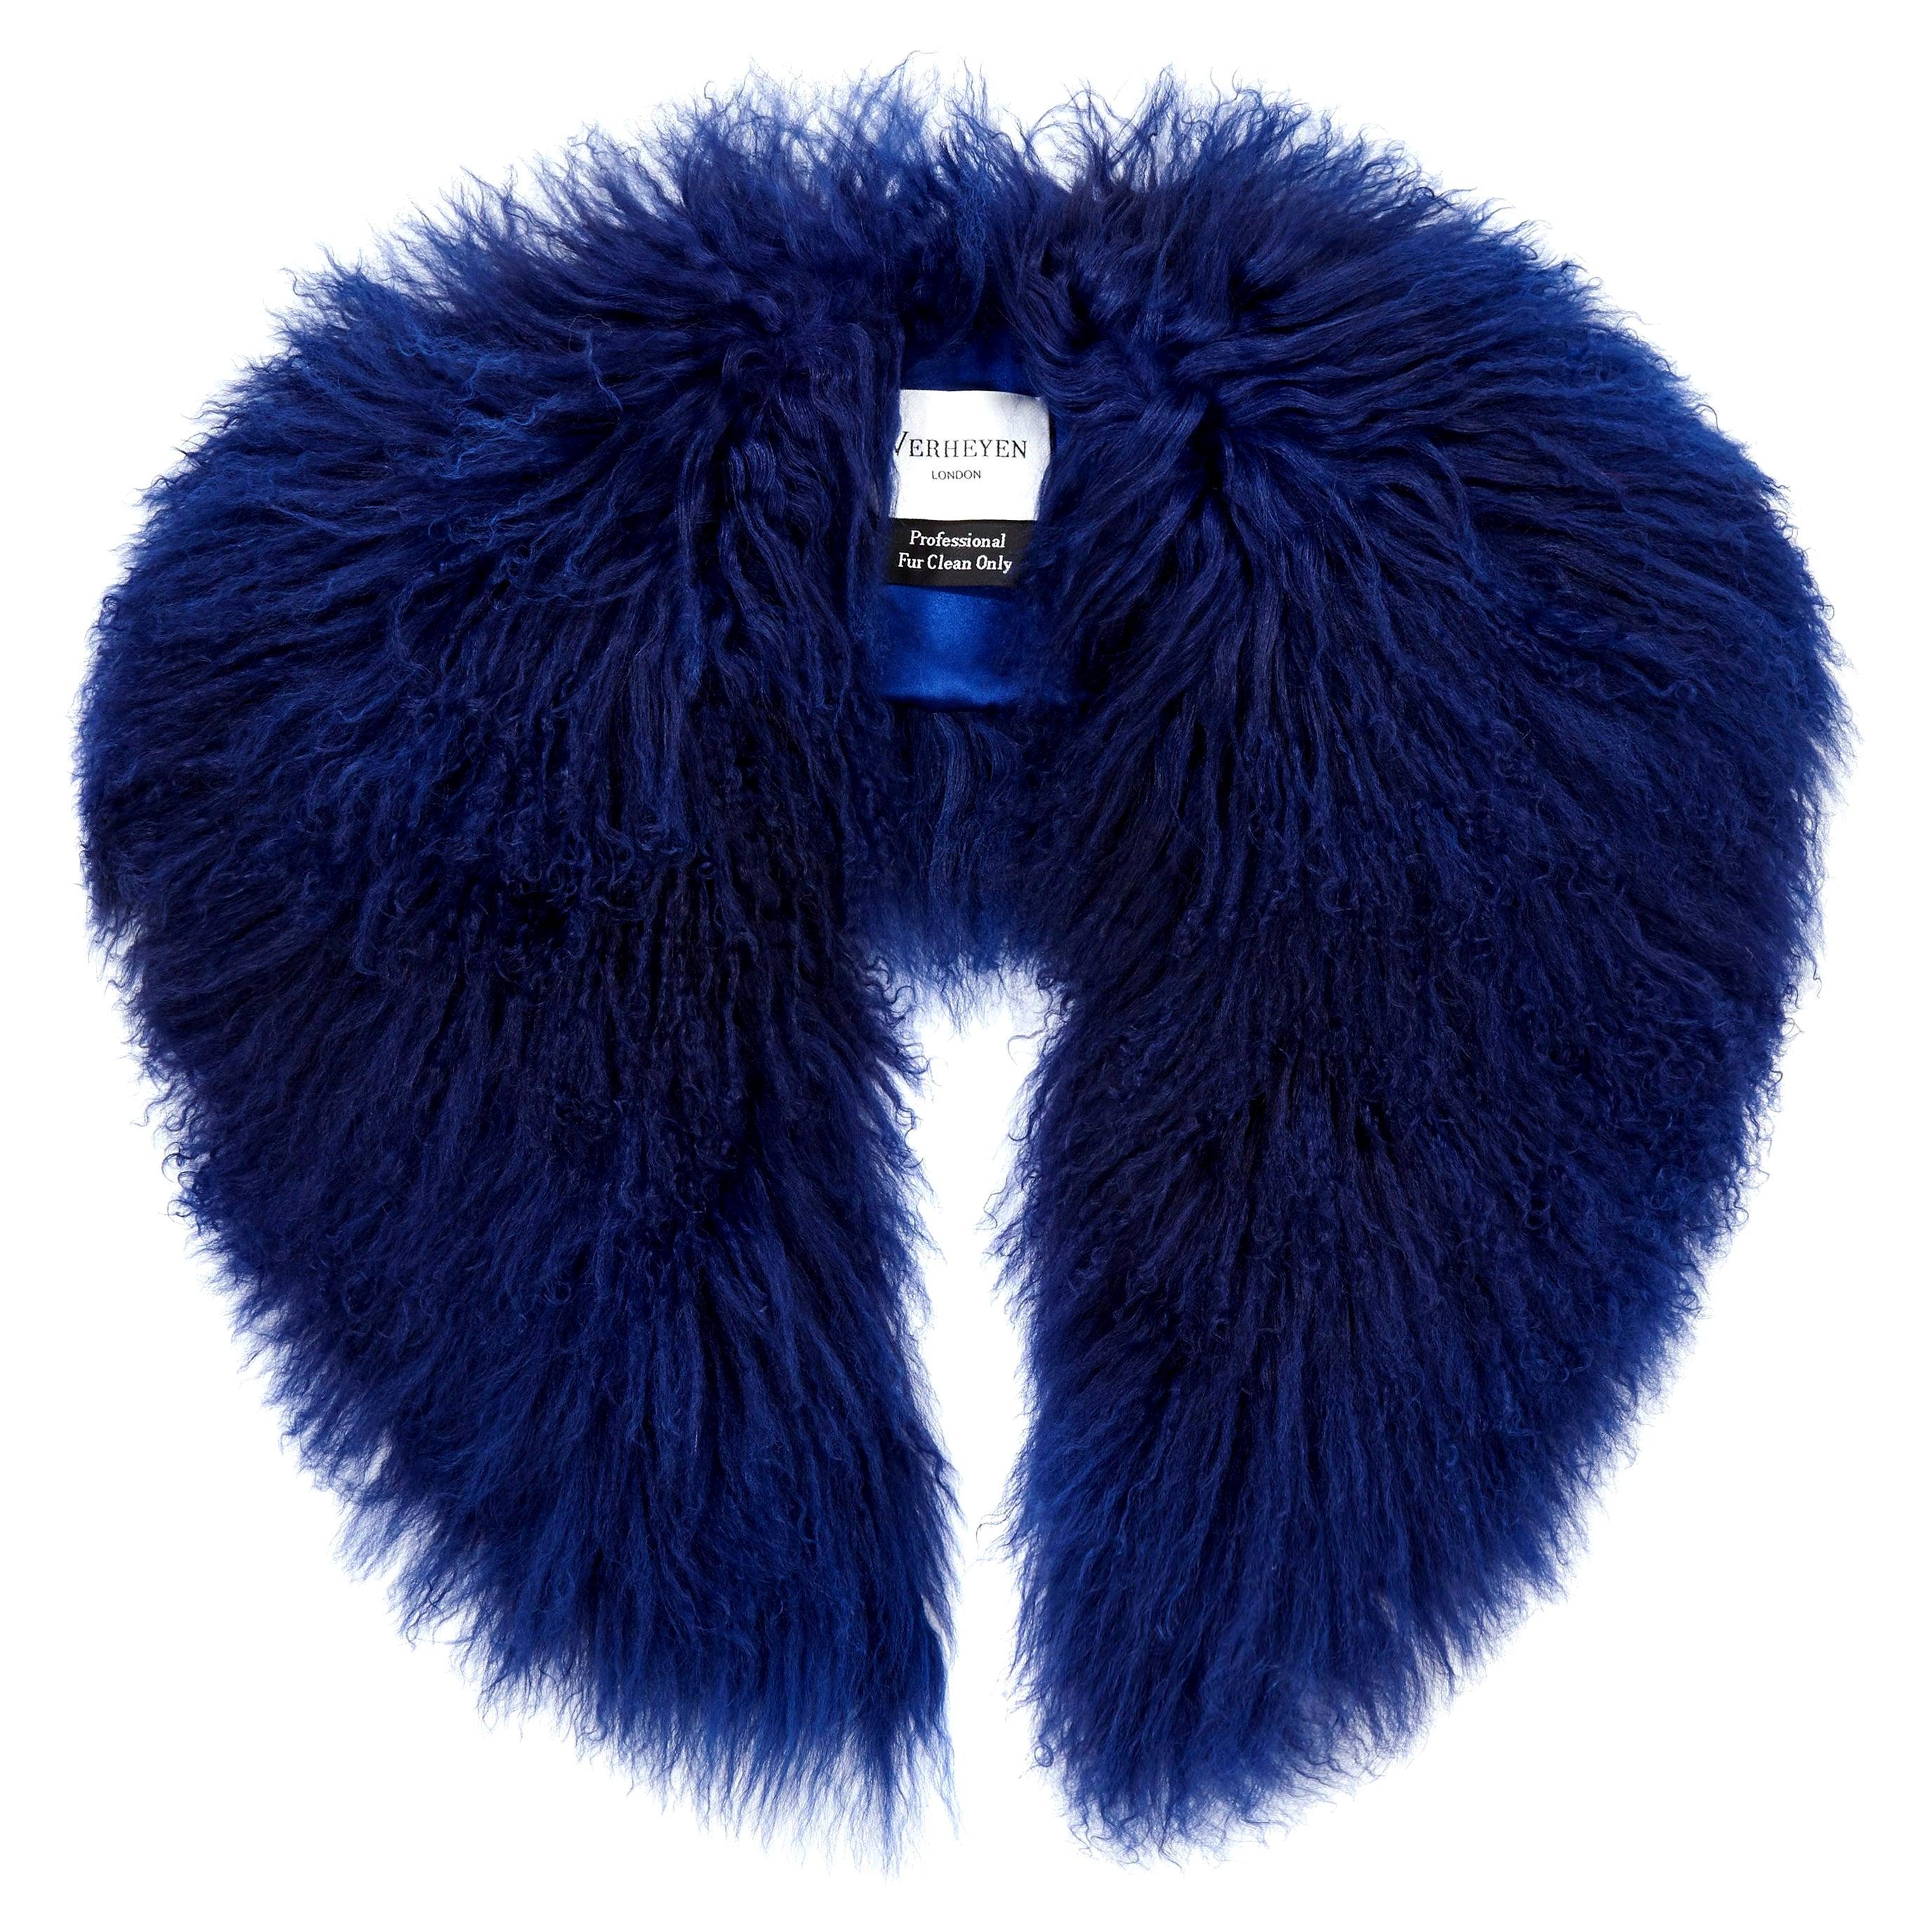 Verheyen London Shawl Collar in Sapphire Blue Mongolian Lamb